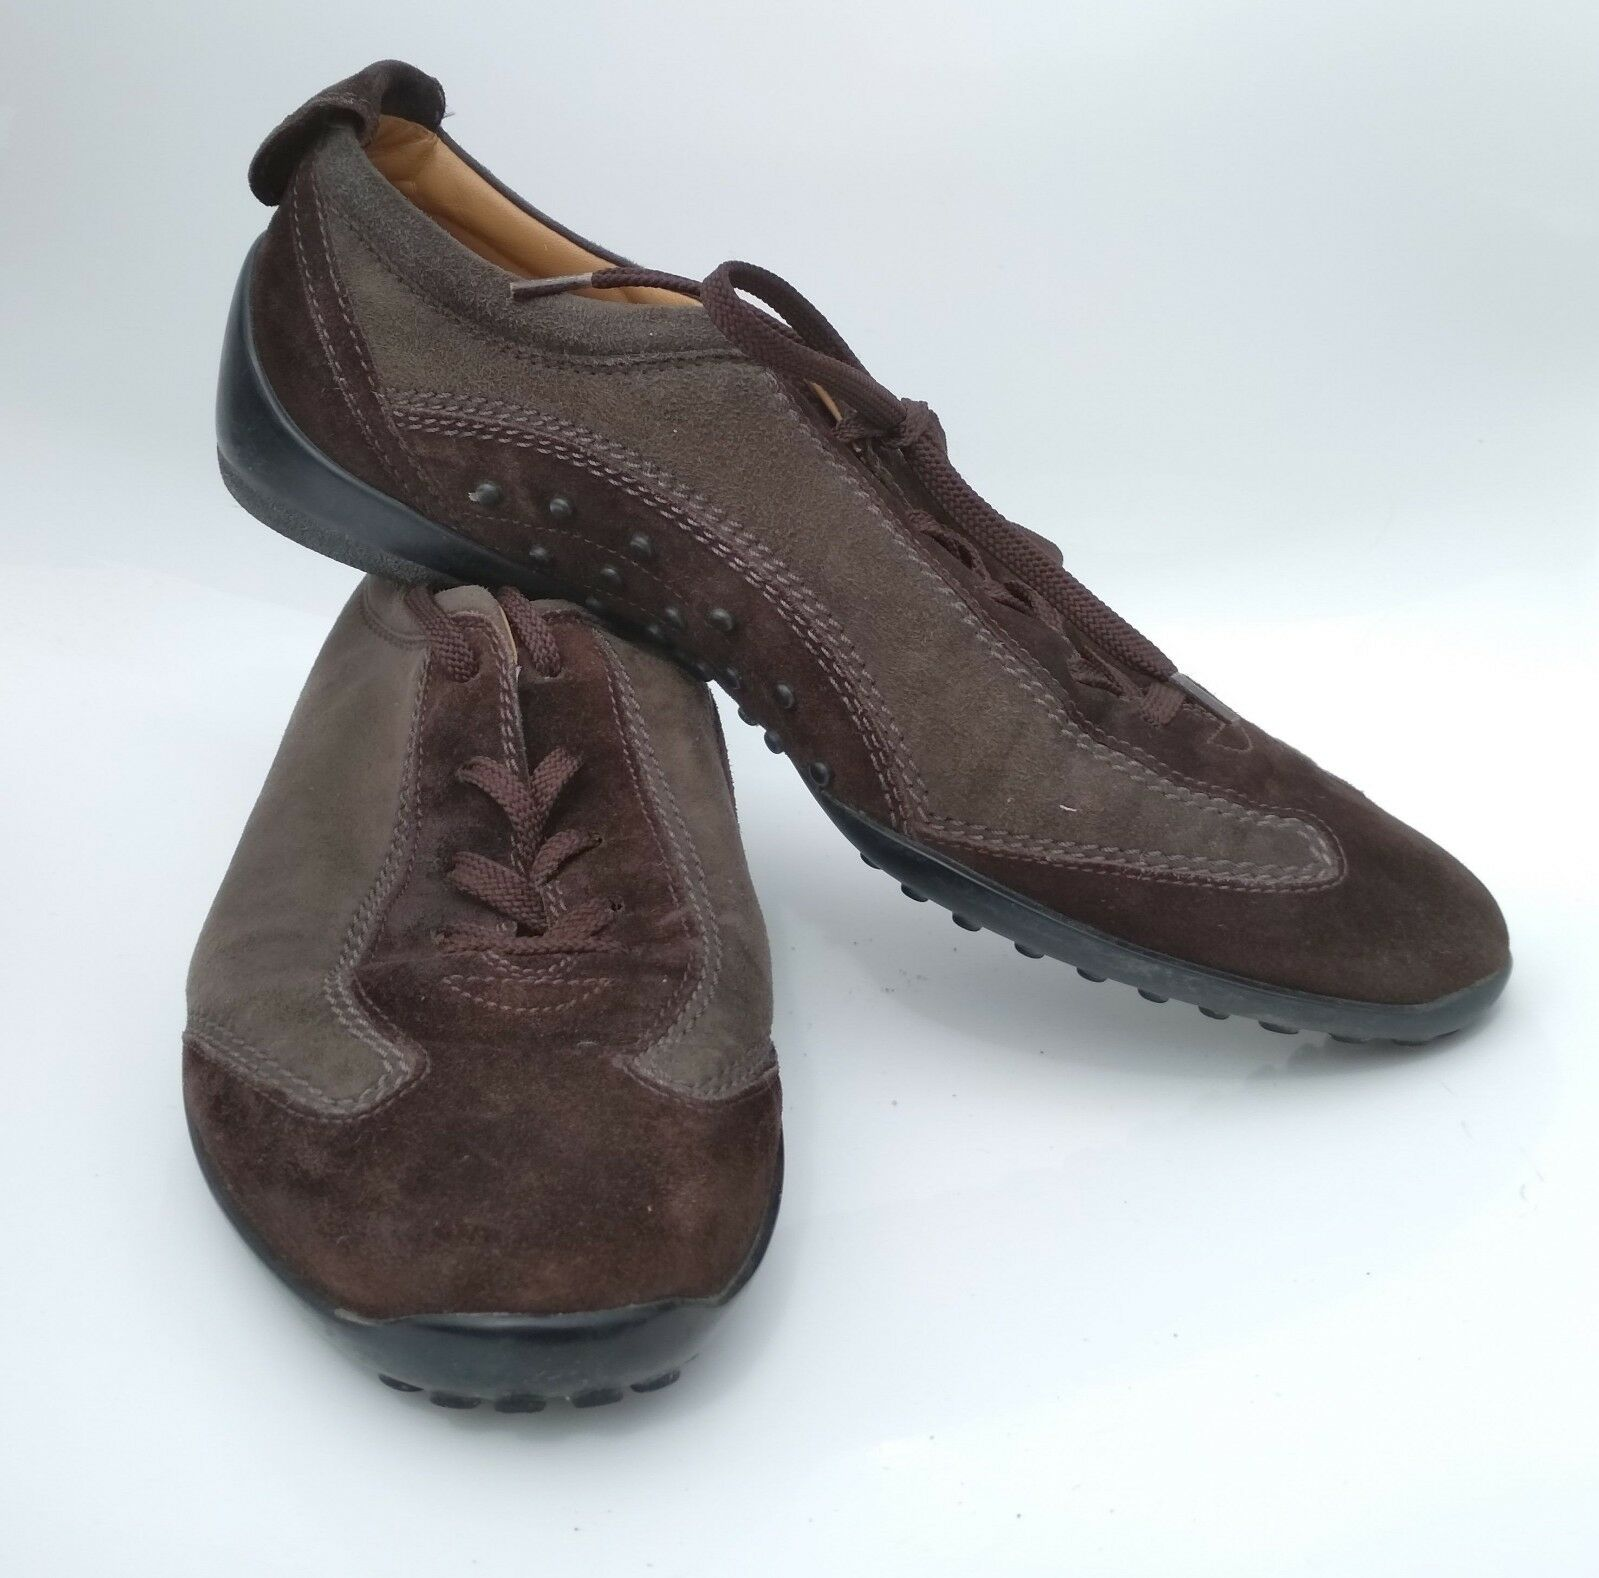 TOD'S femmes chaussures En Cuir Turnchaussures BiCouleure marron Foncé vert Olive T 40 Sport Chaussure